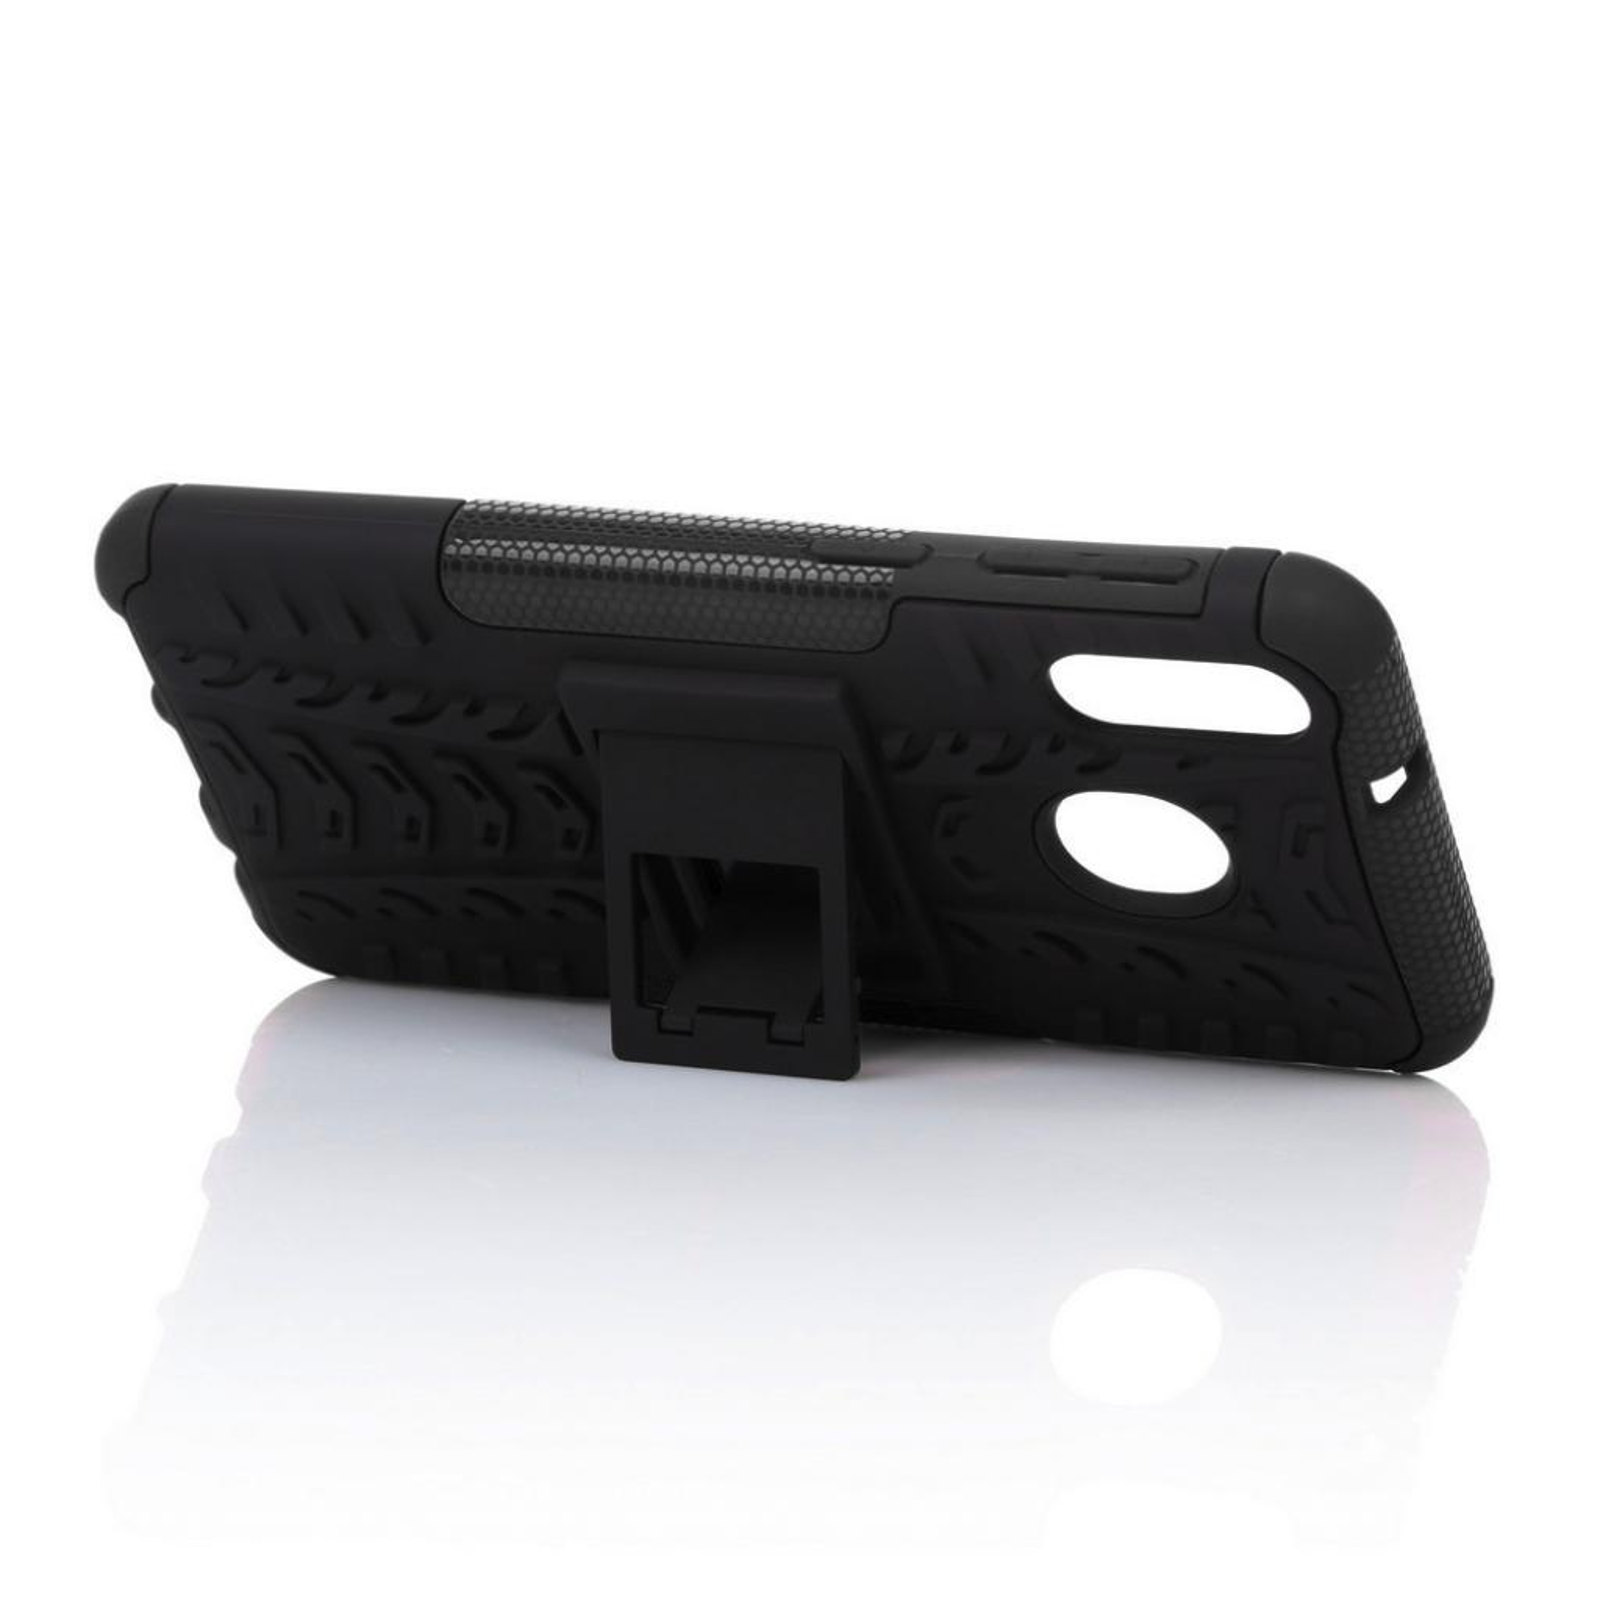 Чехол для моб. телефона BeCover Samsung Galaxy M20 SM-M205 Black (703454) изображение 2